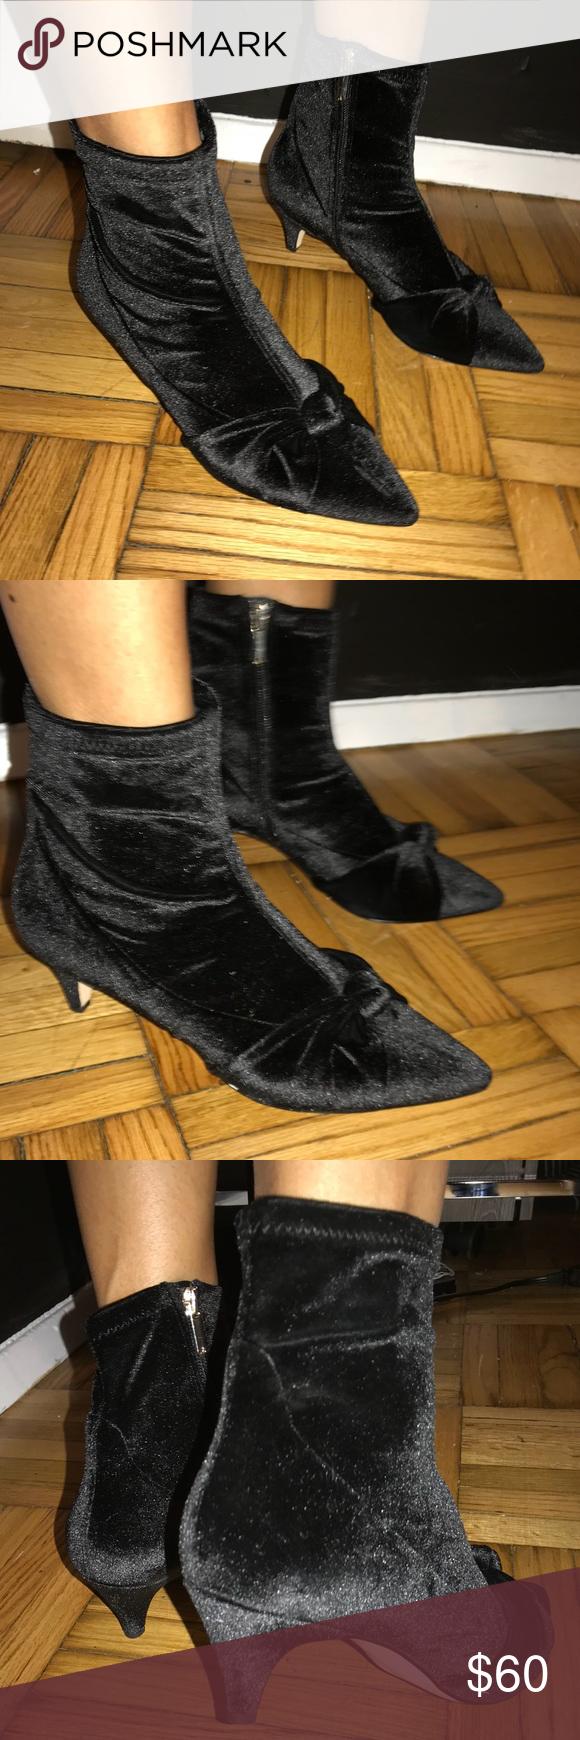 e53305ff5 Boots Sam Edelman Keena Velvet Bootie